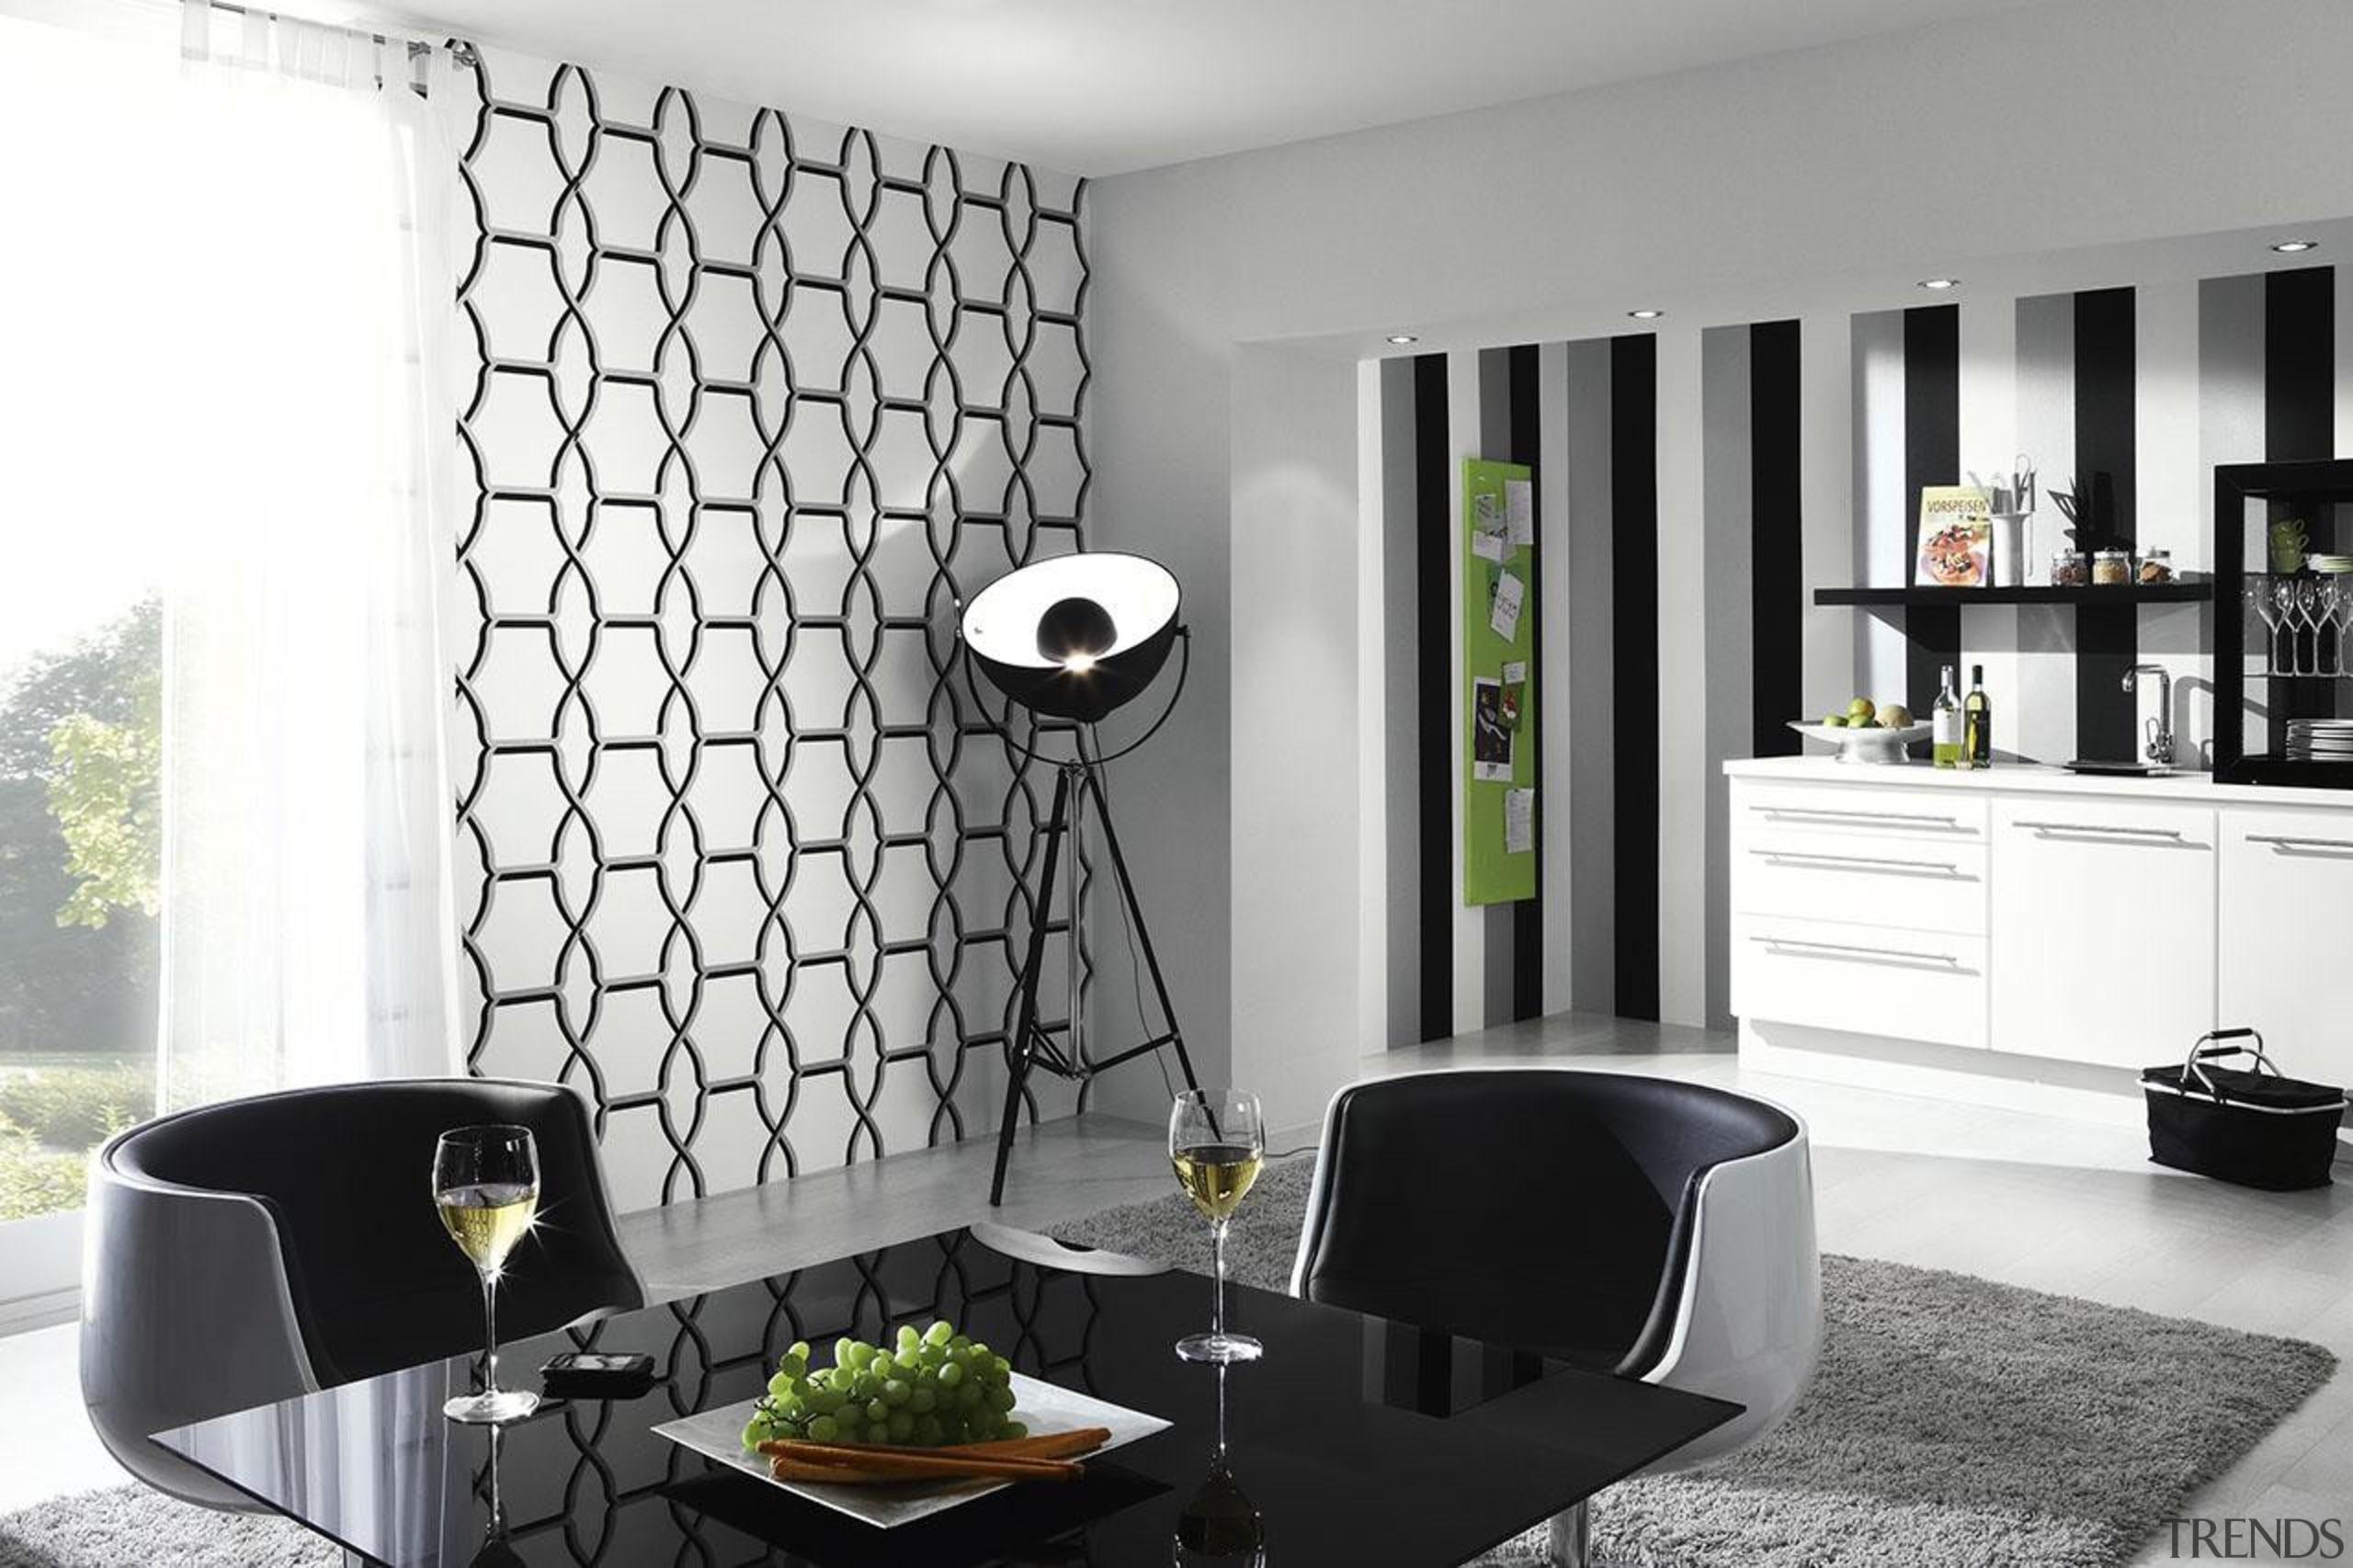 Modern Style Range - Modern Style Range - furniture, interior design, living room, product design, room, table, wall, window, white, gray